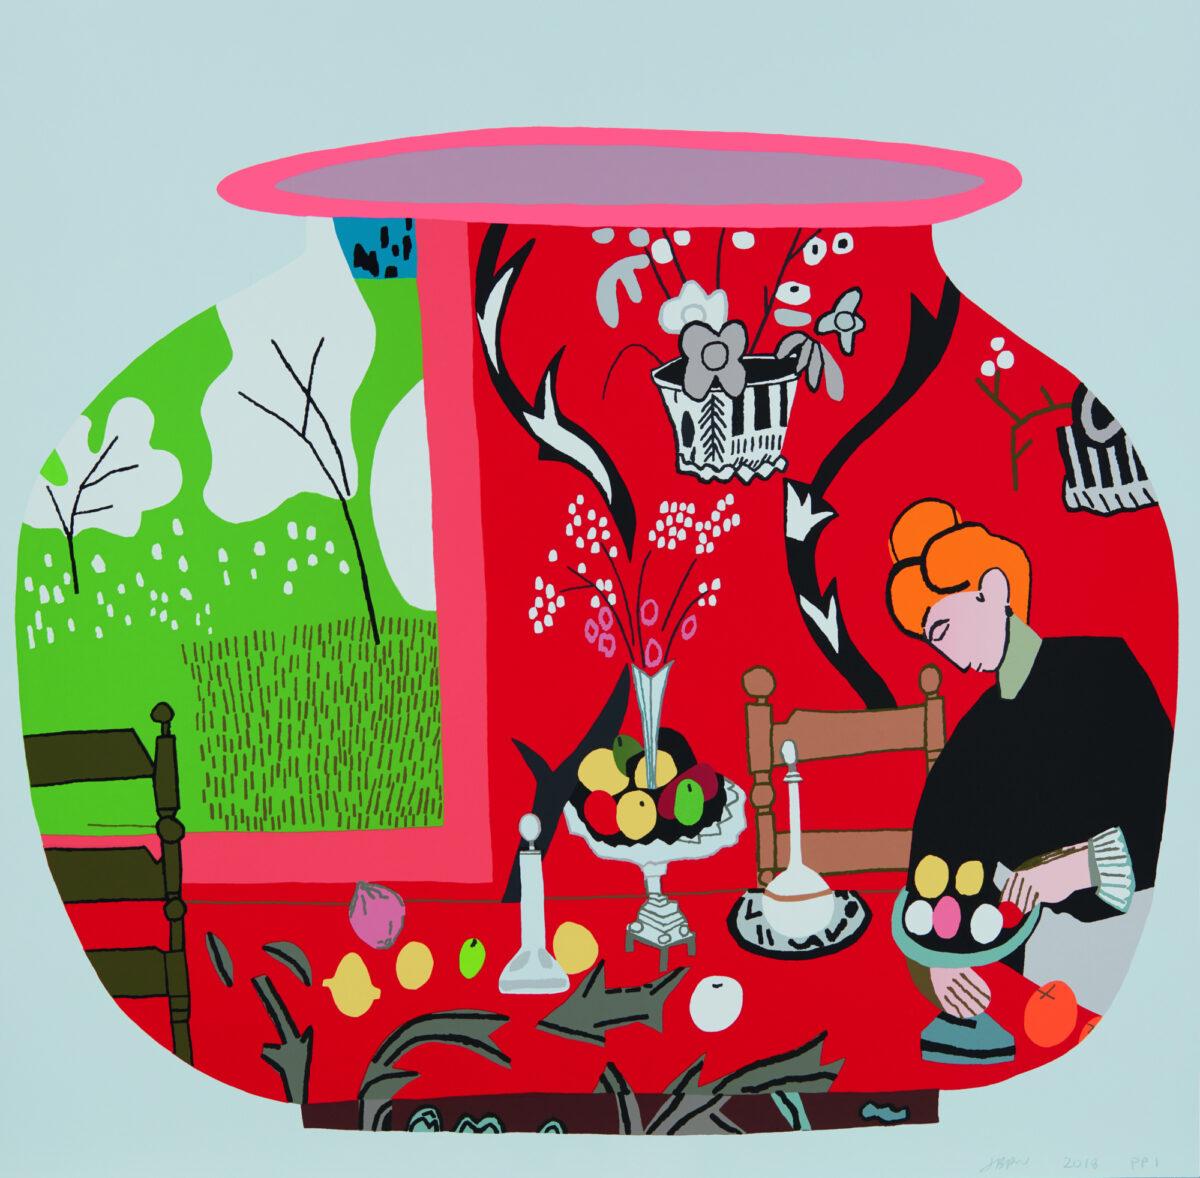 Jonas Wood Matisse Pot 2 original signed colour screenprint for sale